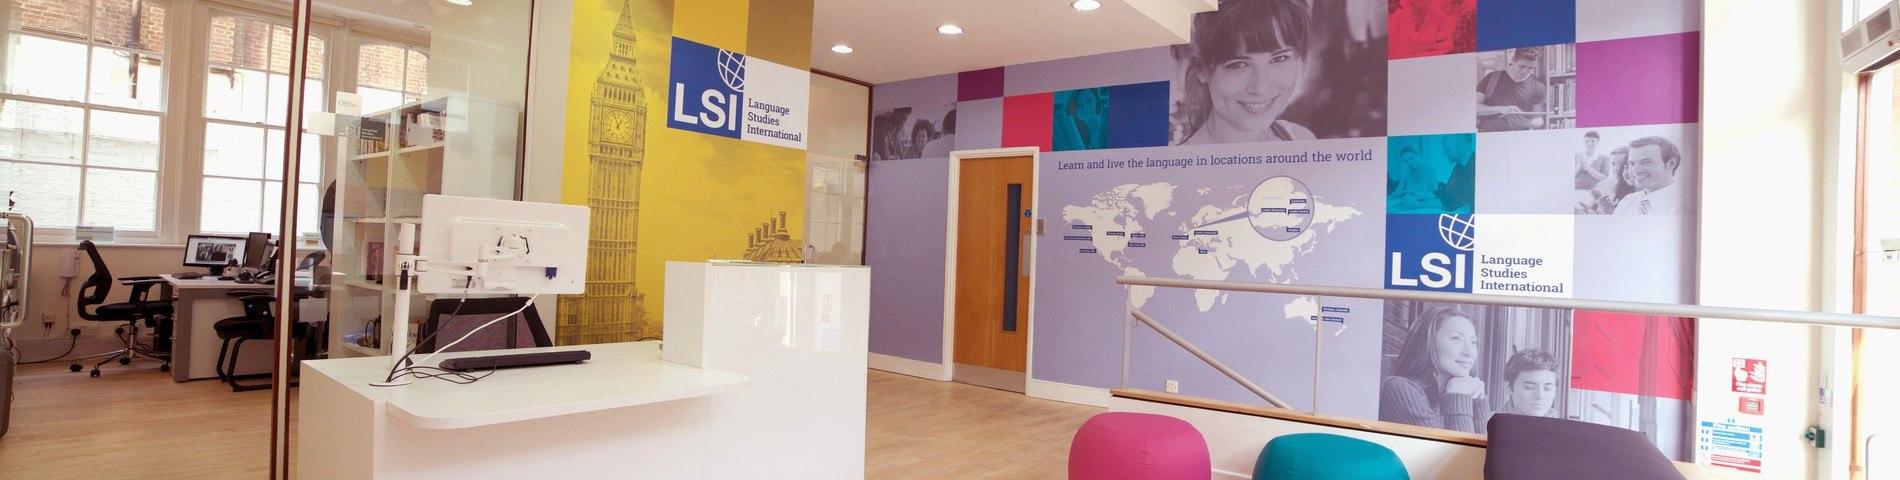 LSI - Language Studies International - Central immagine 1